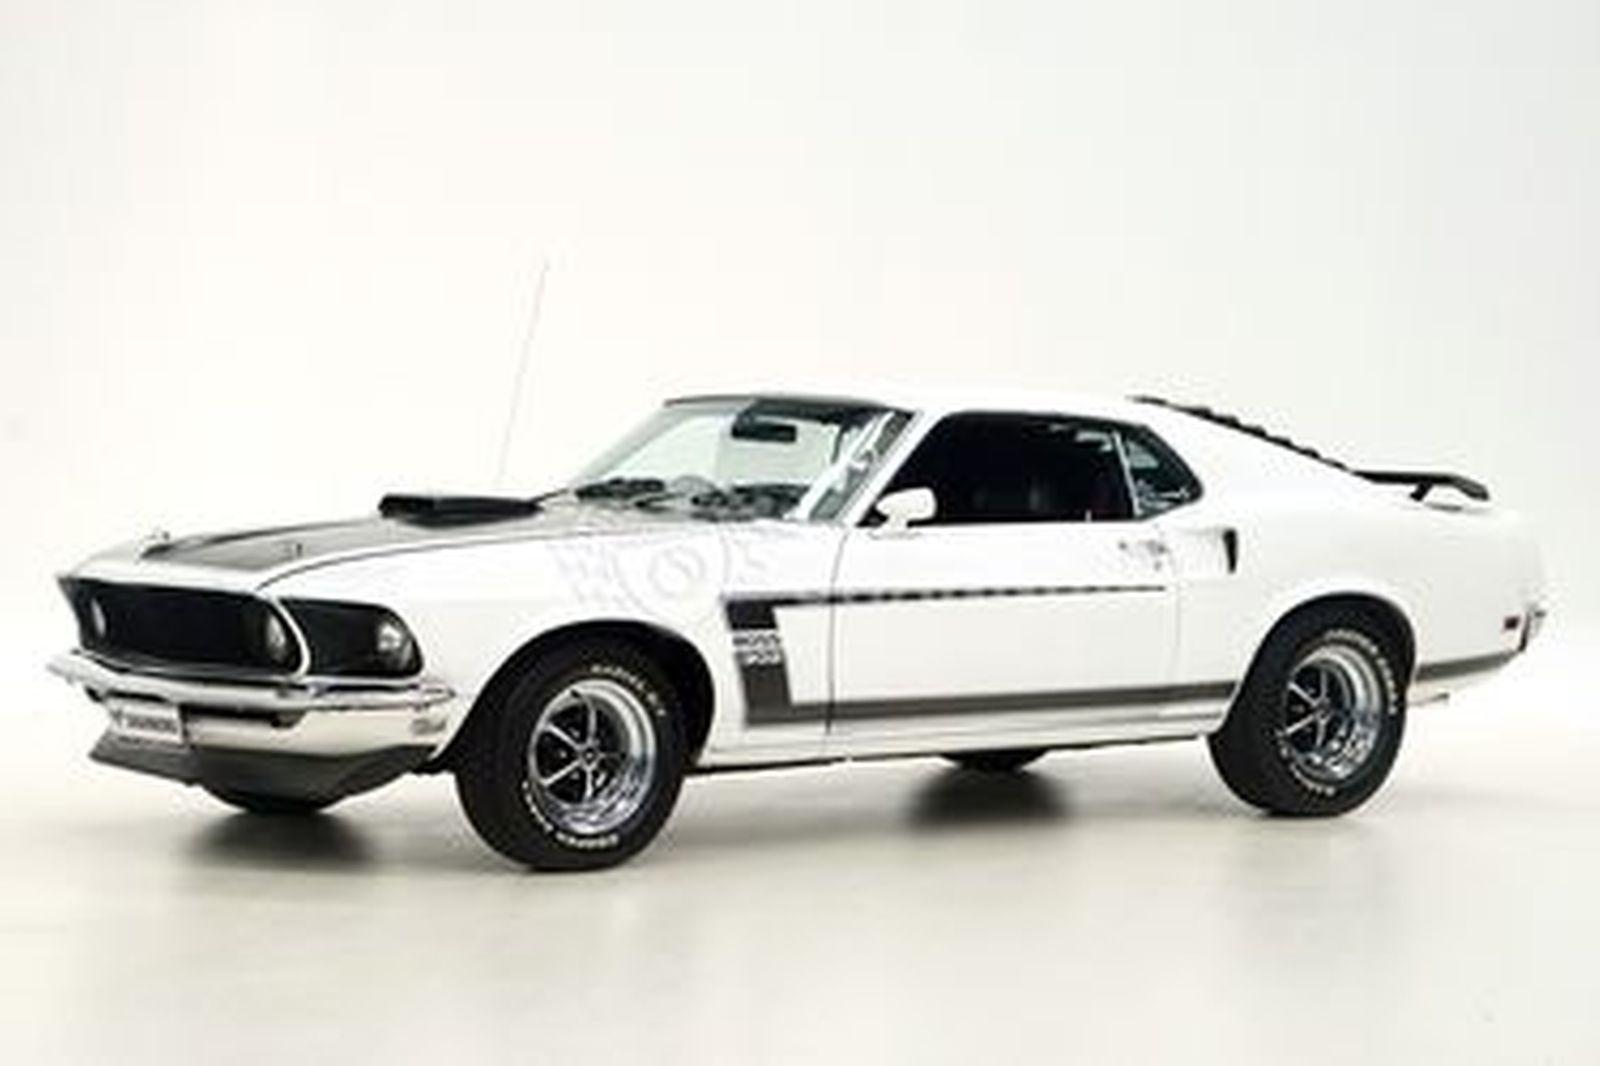 Ford Mustang 'Boss 302 Tribute' Fastback (RHD)